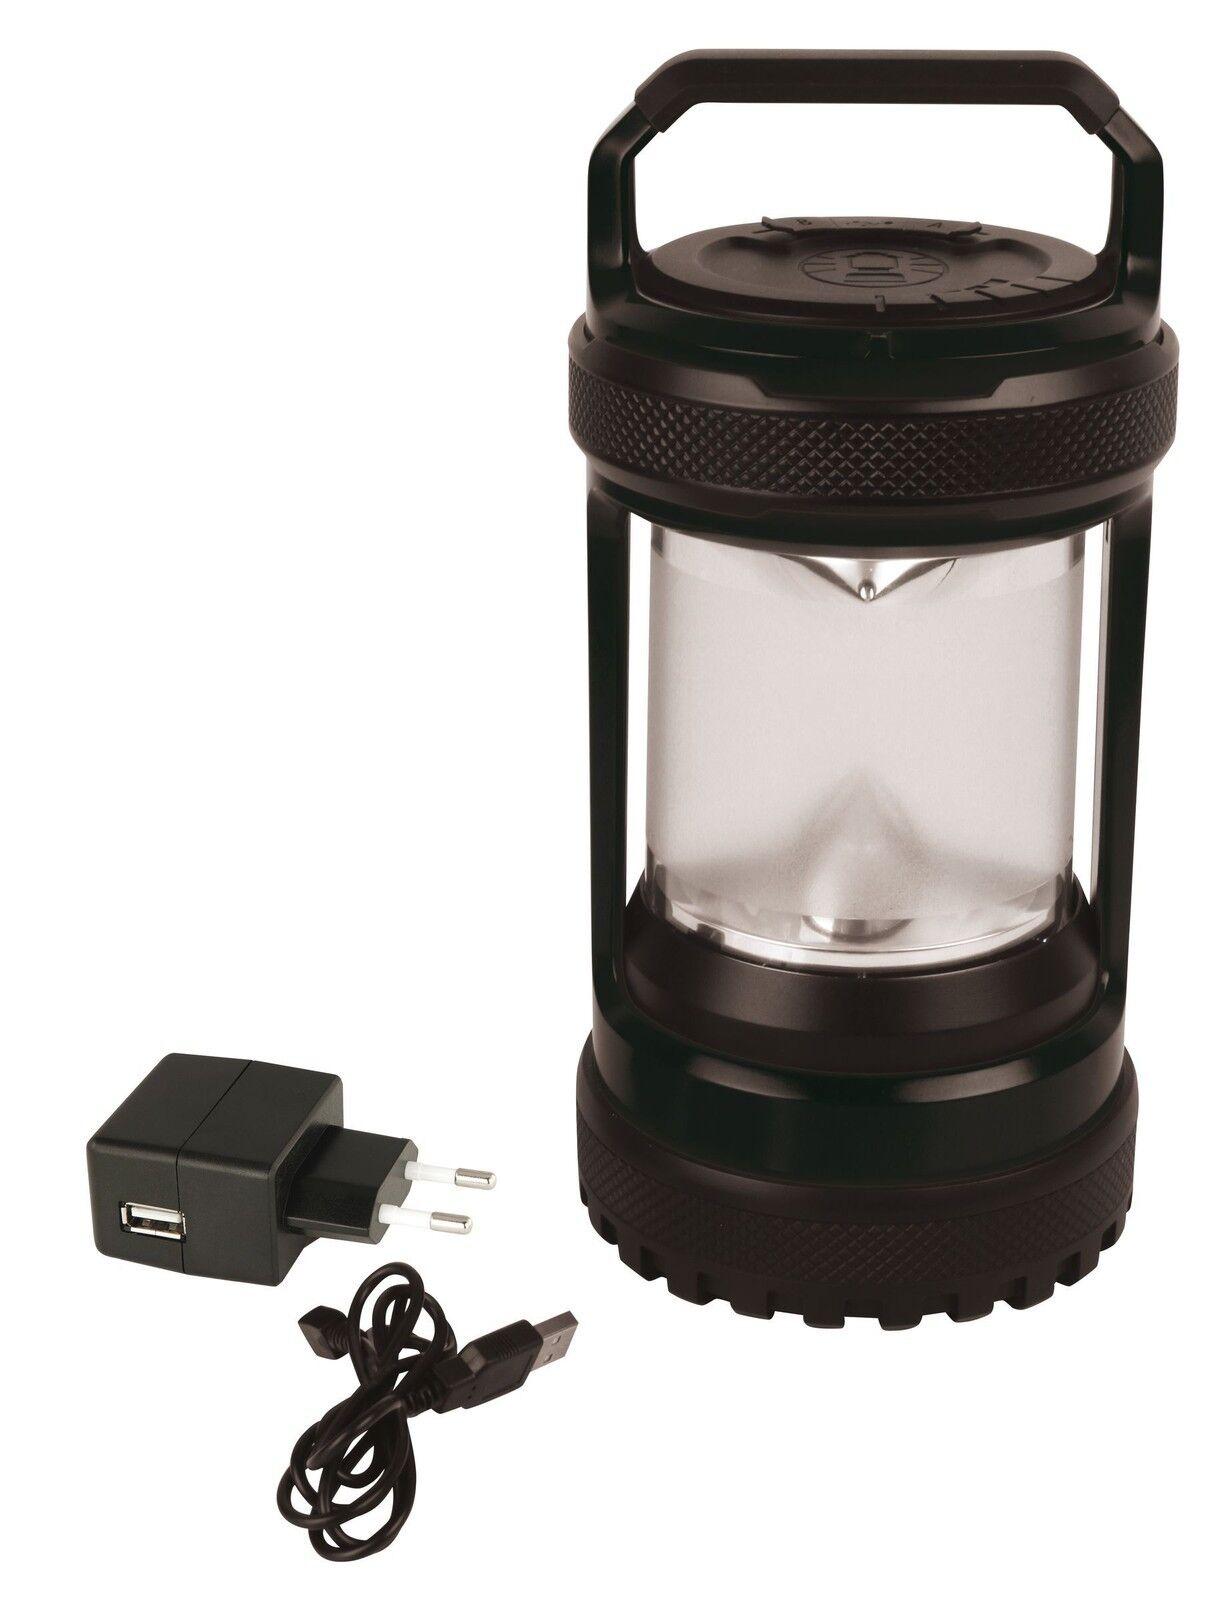 Coleman  Twist +300 Rechargeable Led Lantern 2000025920  hot sports